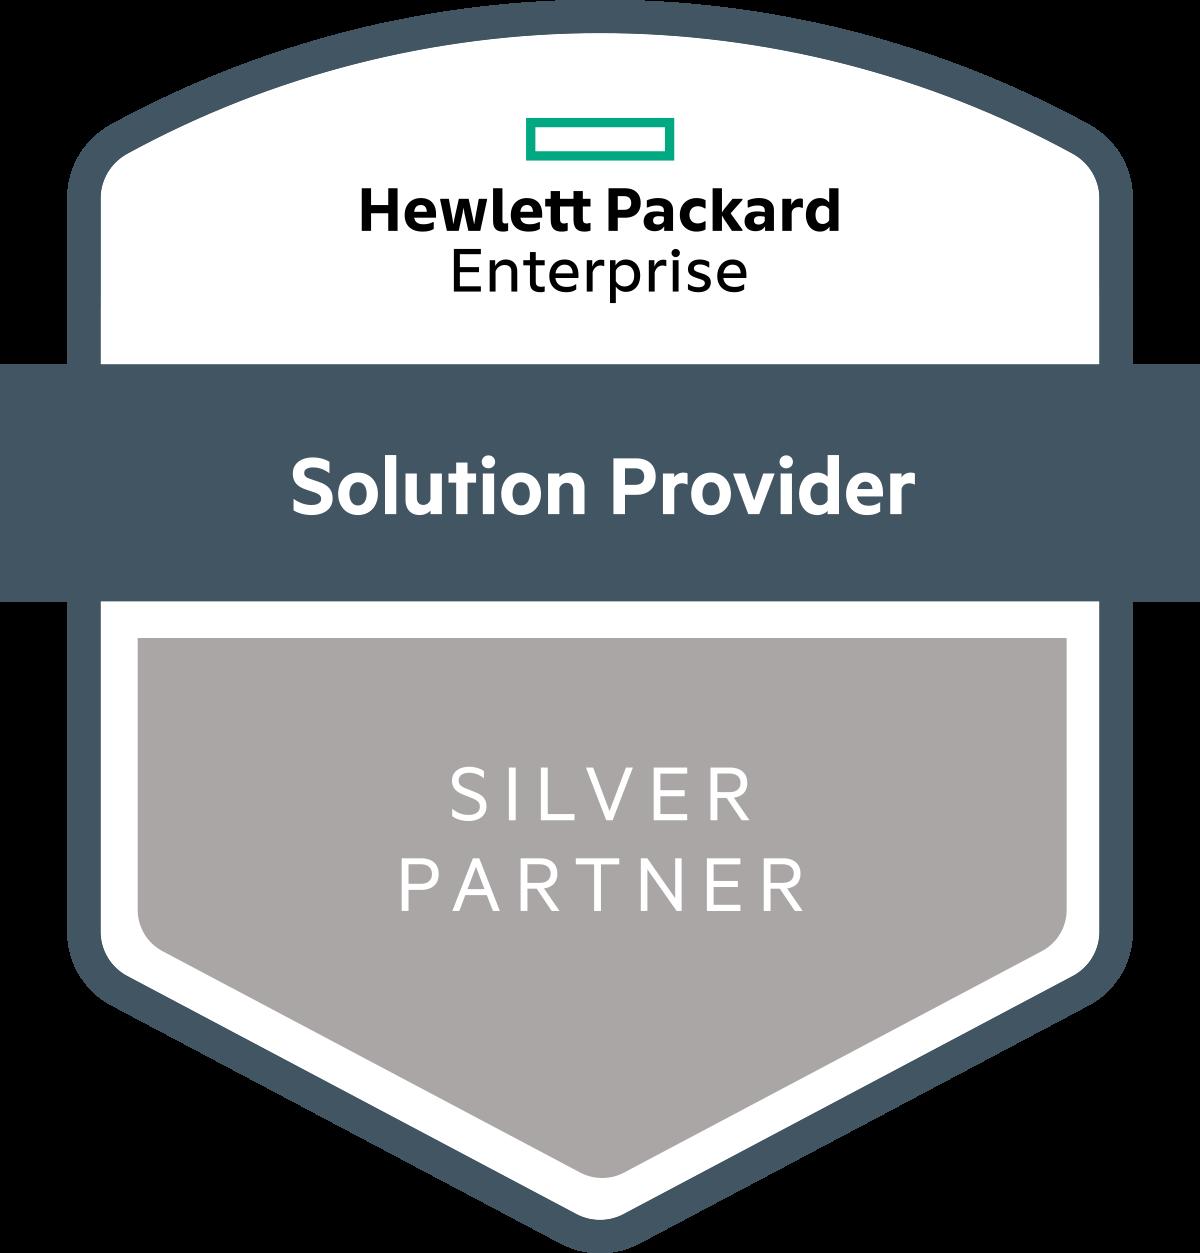 Hewlet Packard - Solution Provider